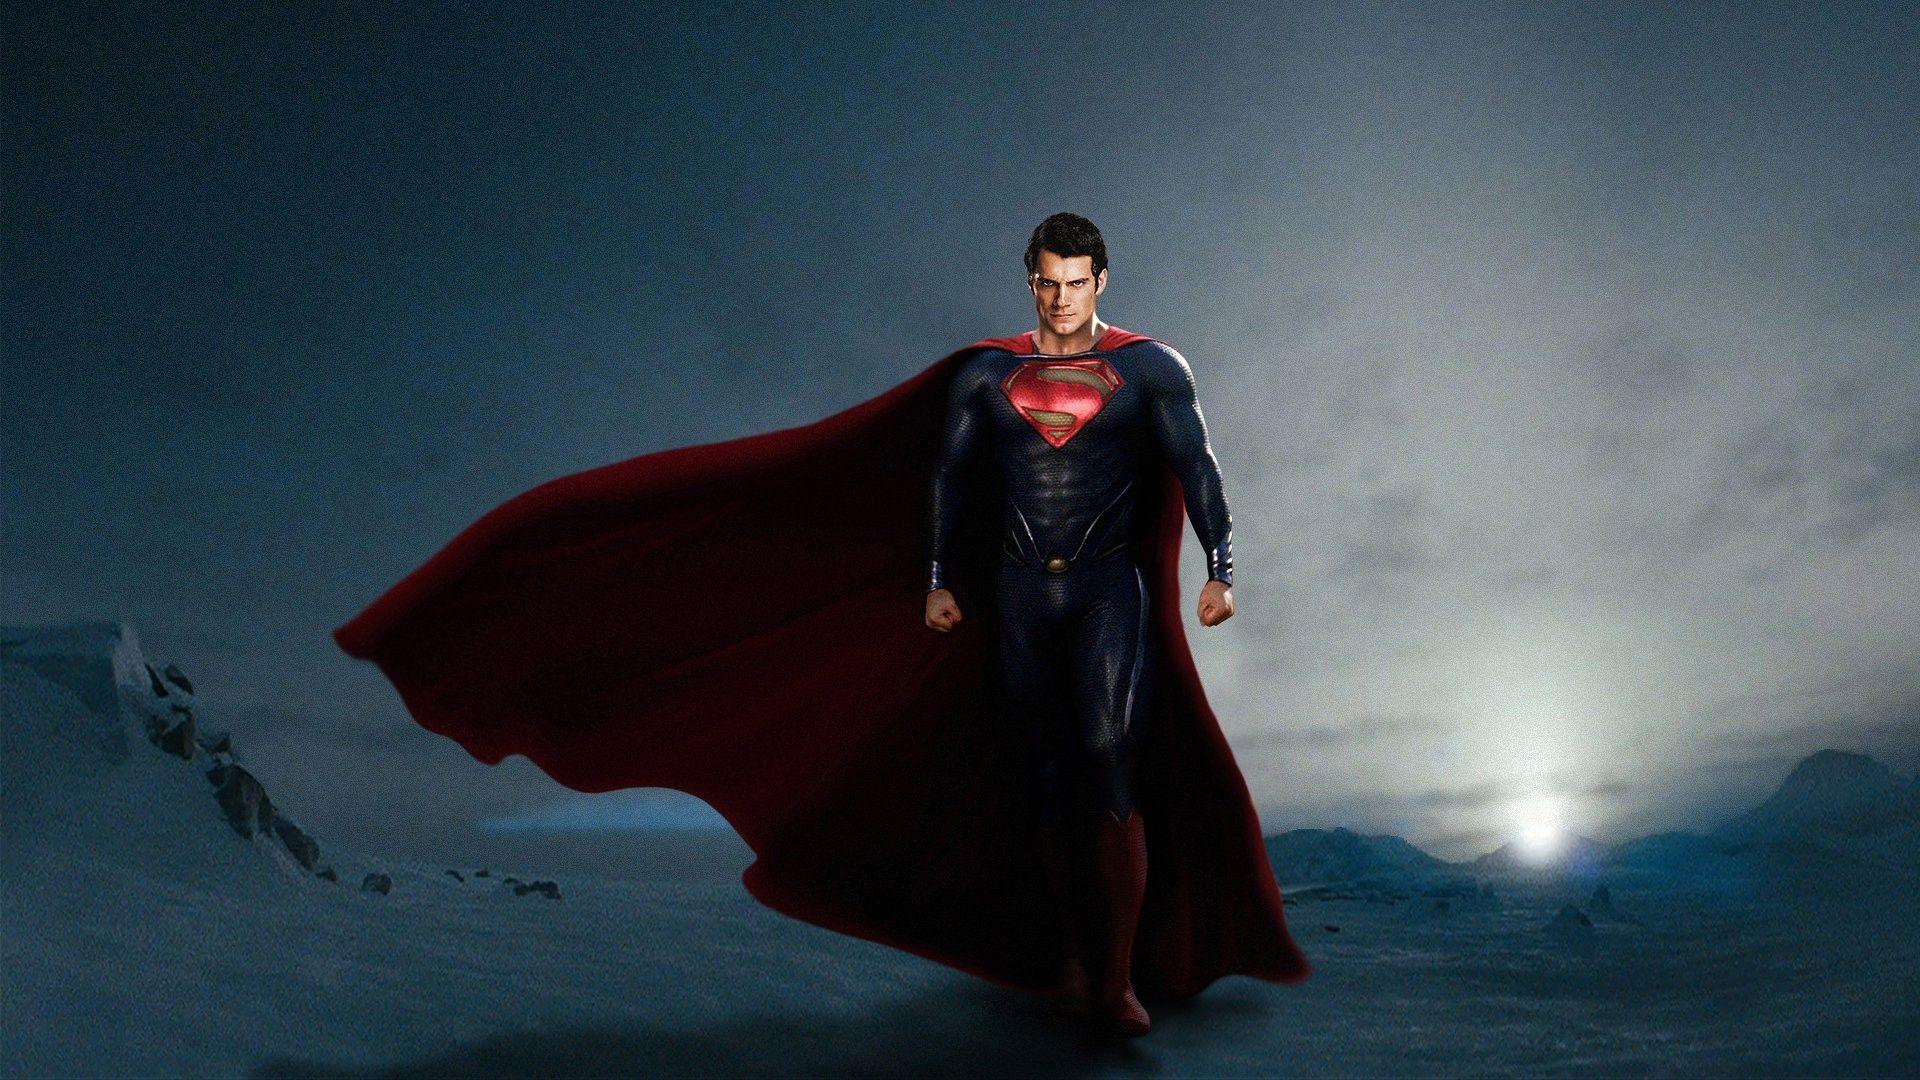 Superman Man Of Steel 1080p HD Wallpapers 1080p HD Wallpapers 1920x1080